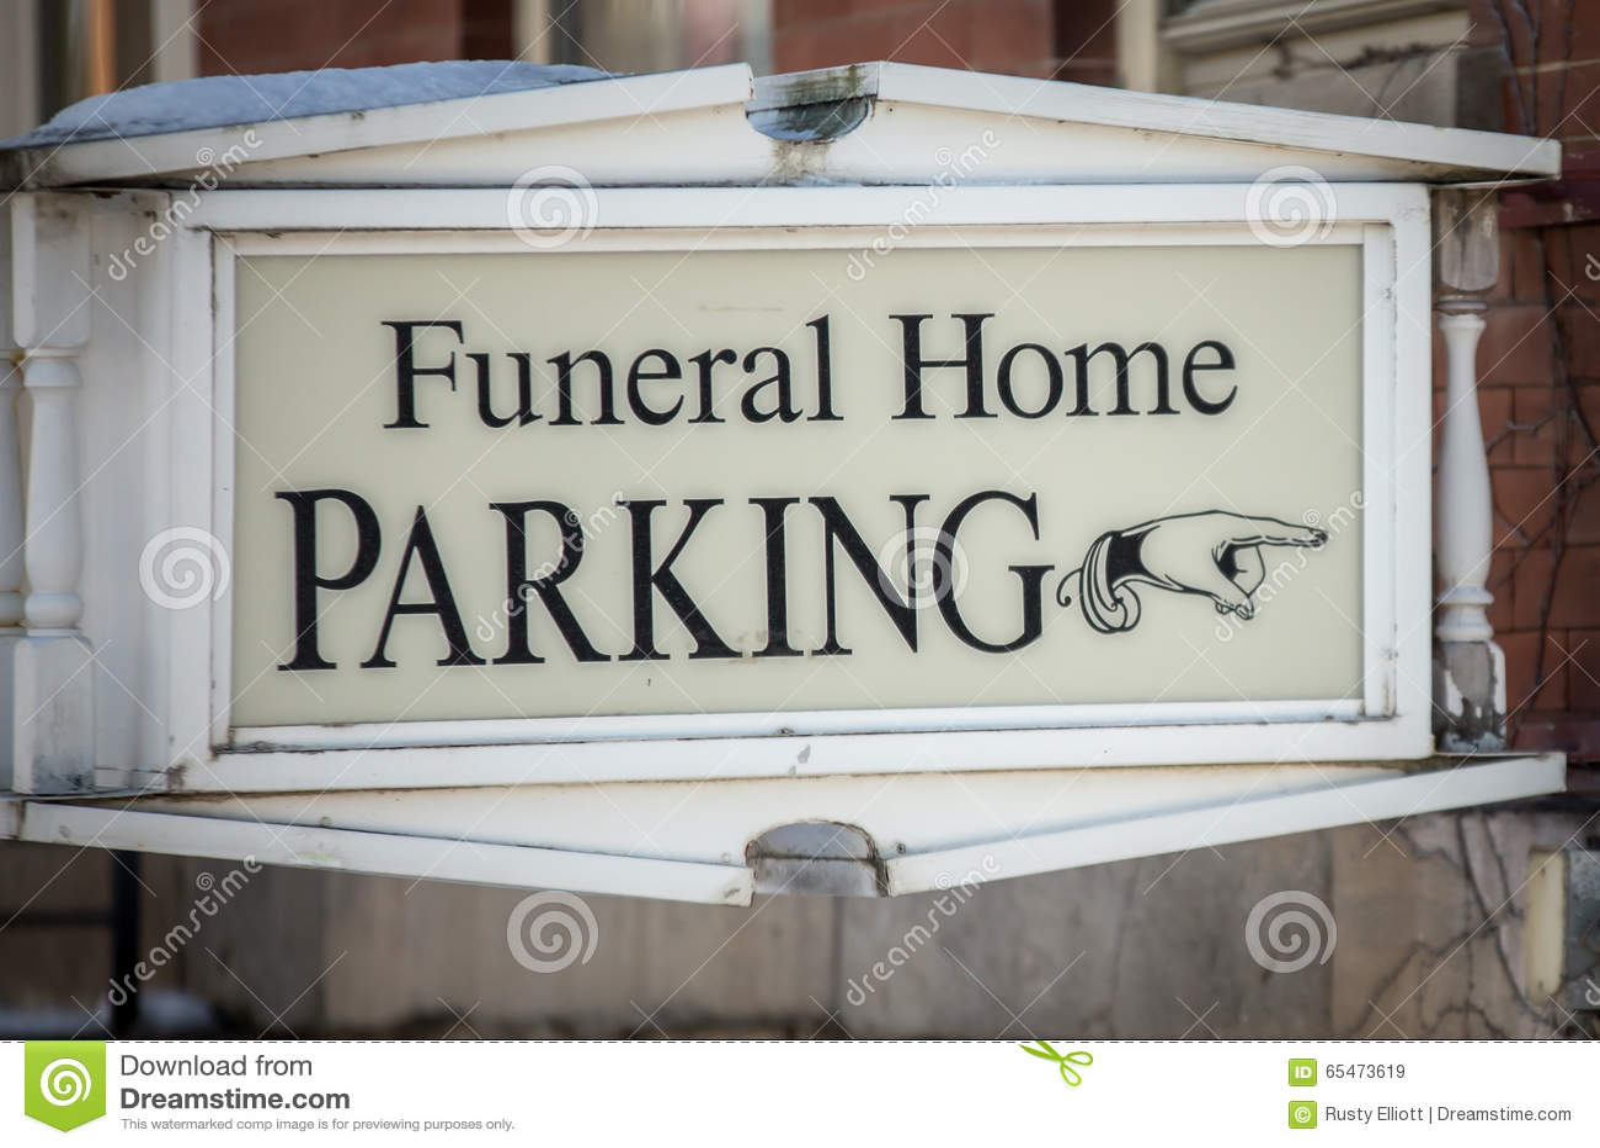 Funeral Home Parking Sign Stock Illustration Image 65473619